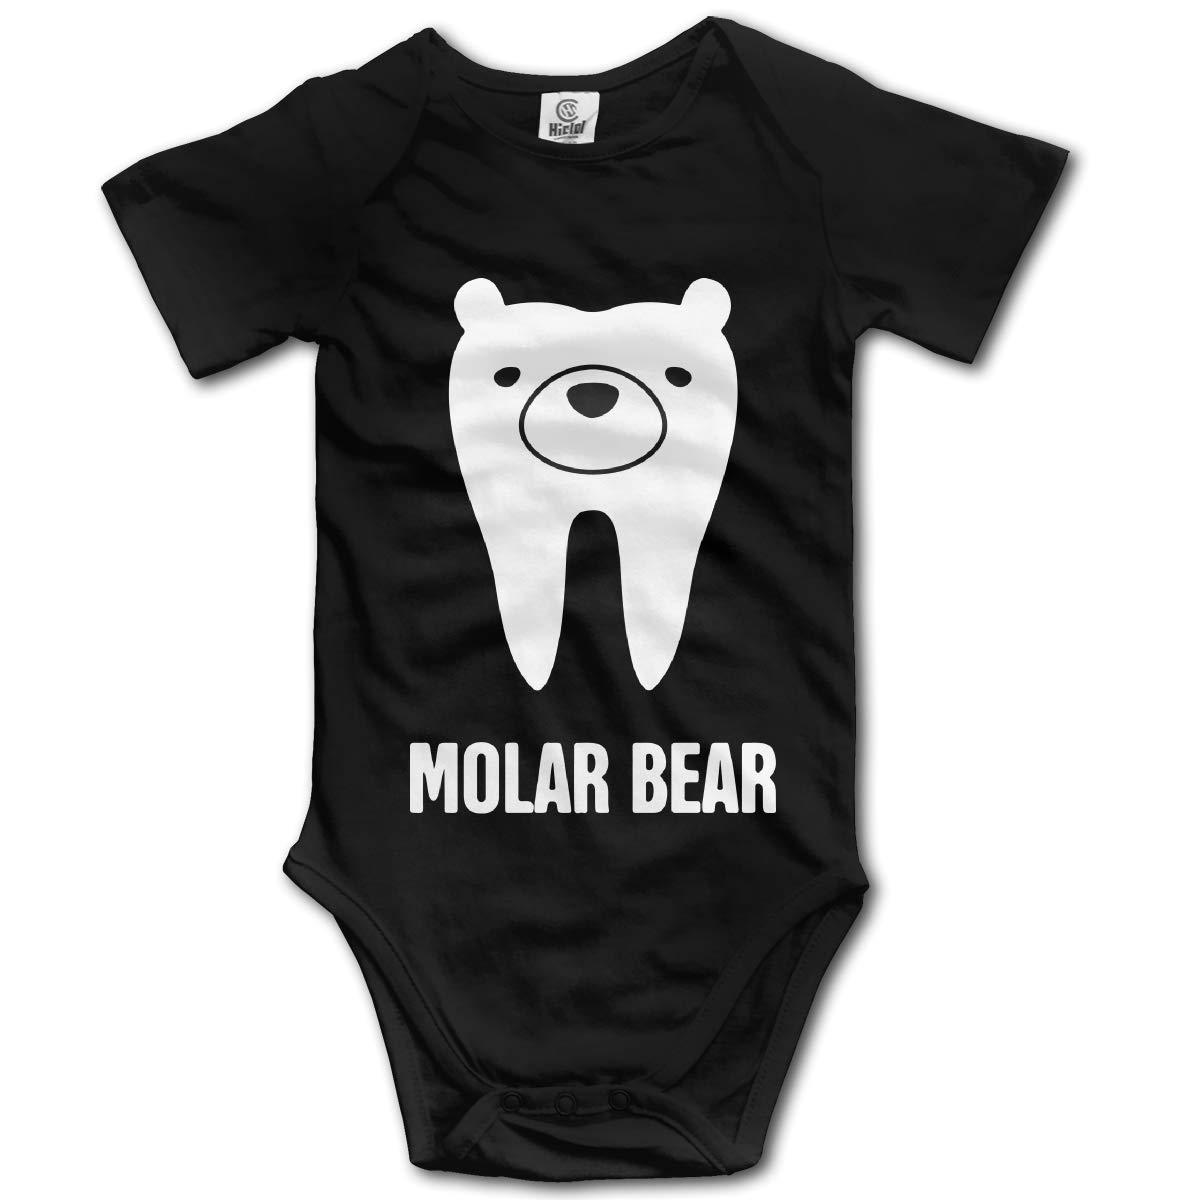 J122 Molar Bear Suit 6-24 Months Newborn Short Sleeve Baby Clothes Climbing Clothes